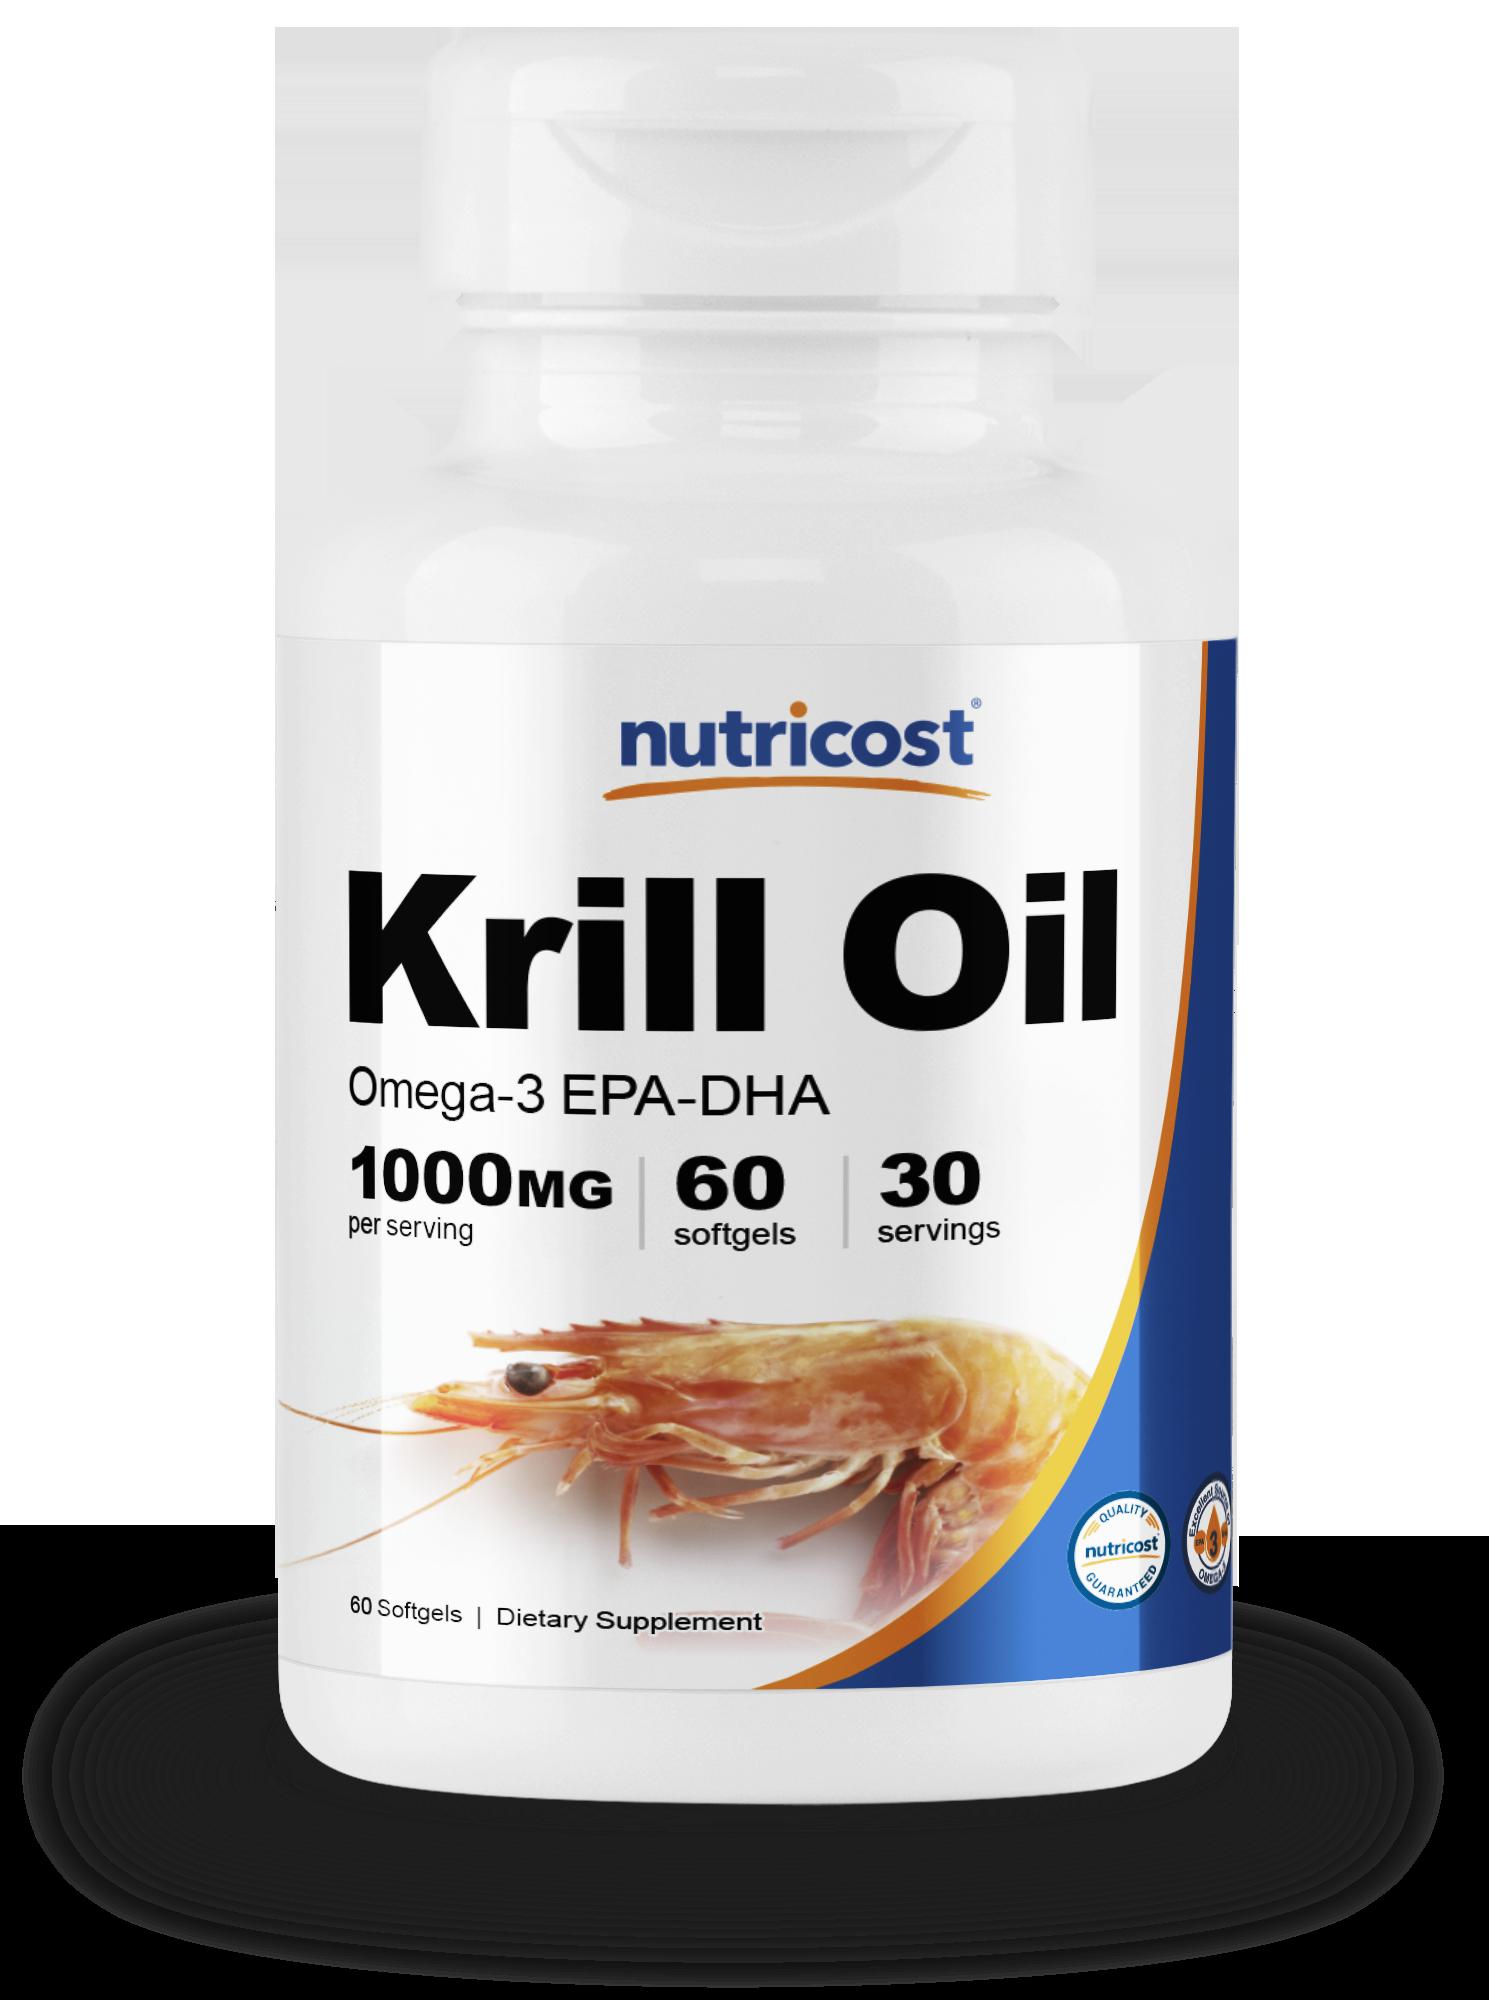 Nutricost Krill Oil